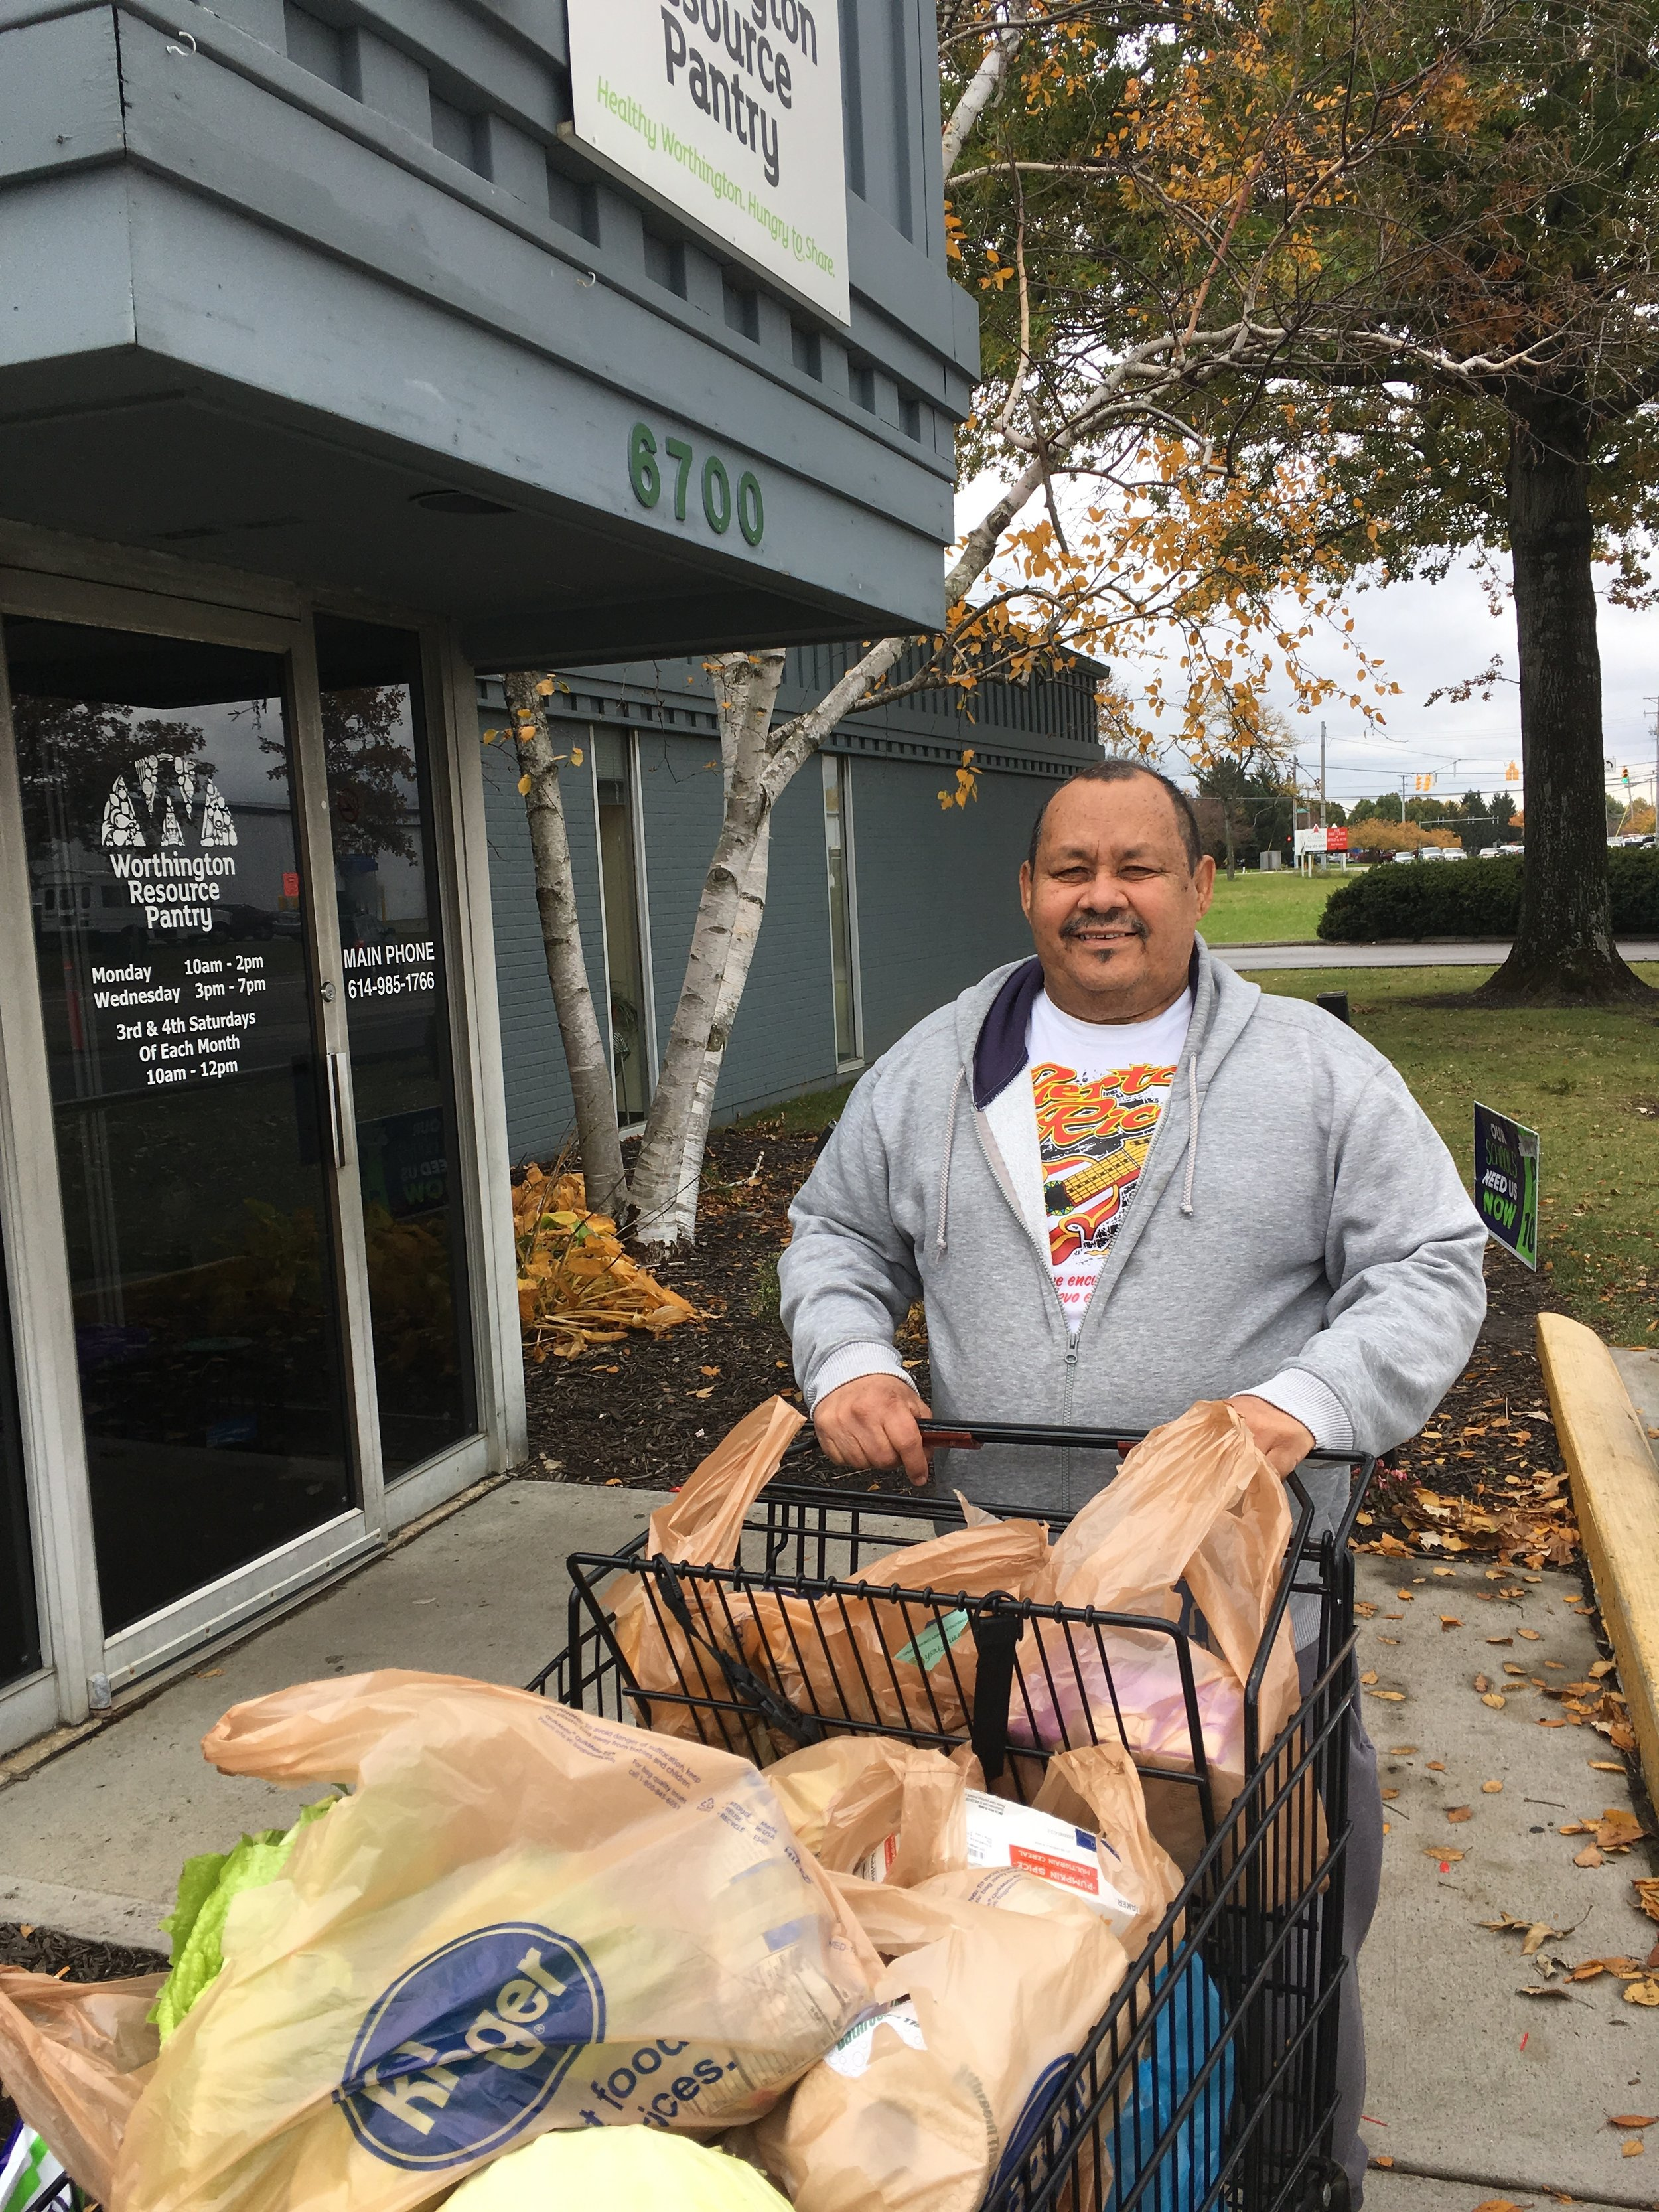 Neighbor Hector Ramos Photo Release on File Nov 5 18.JPG